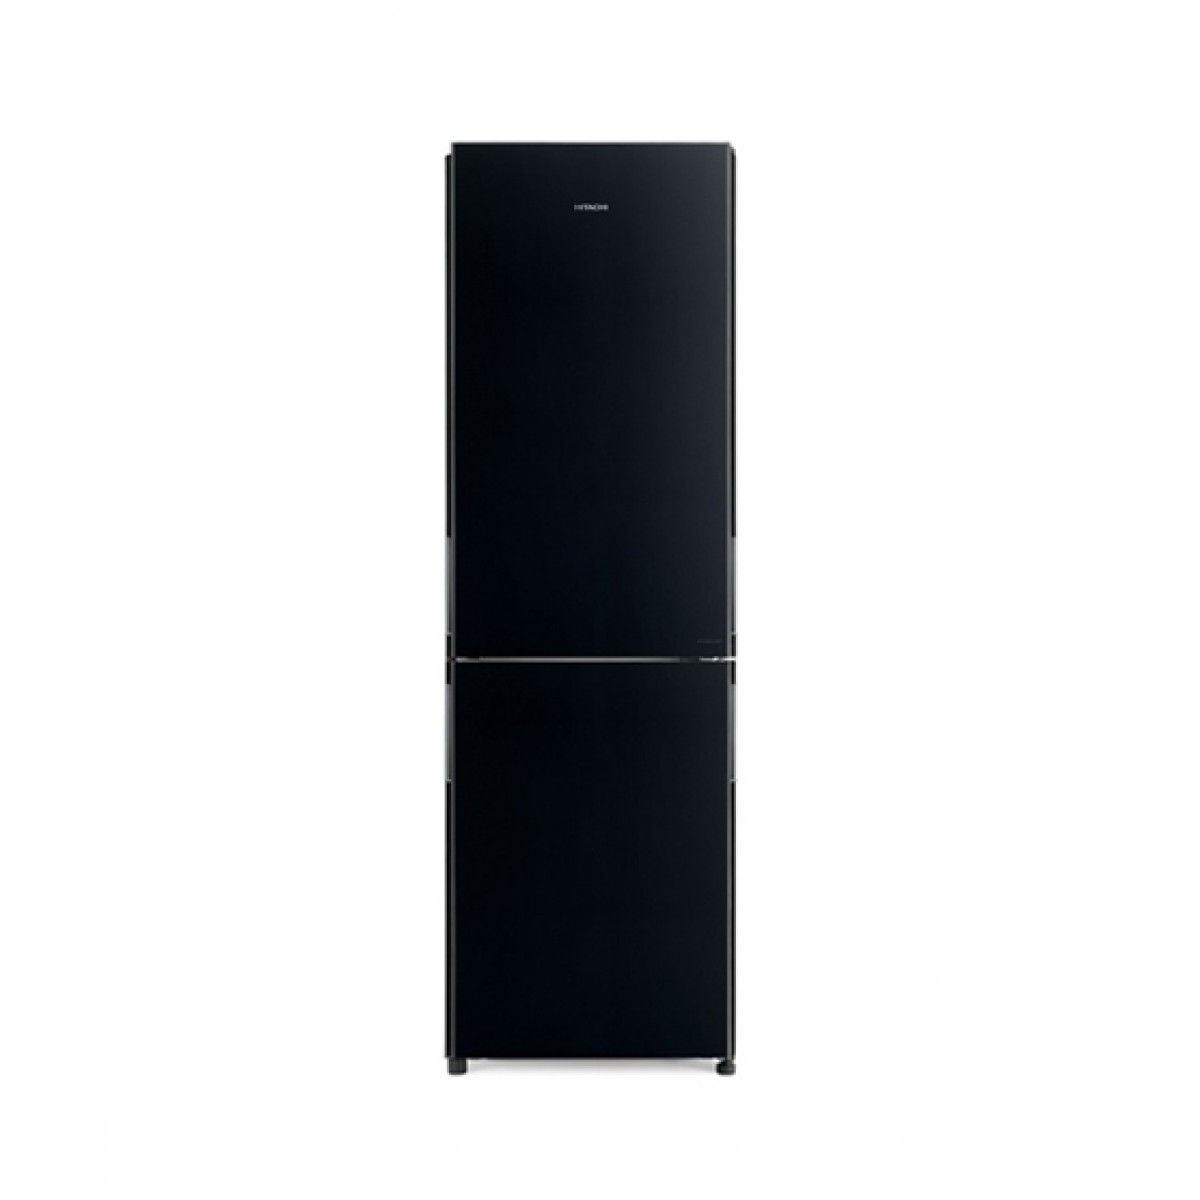 Hitachi (R-BG410P6PB) Freezer-on-Top 12 cu ft Refrigerator